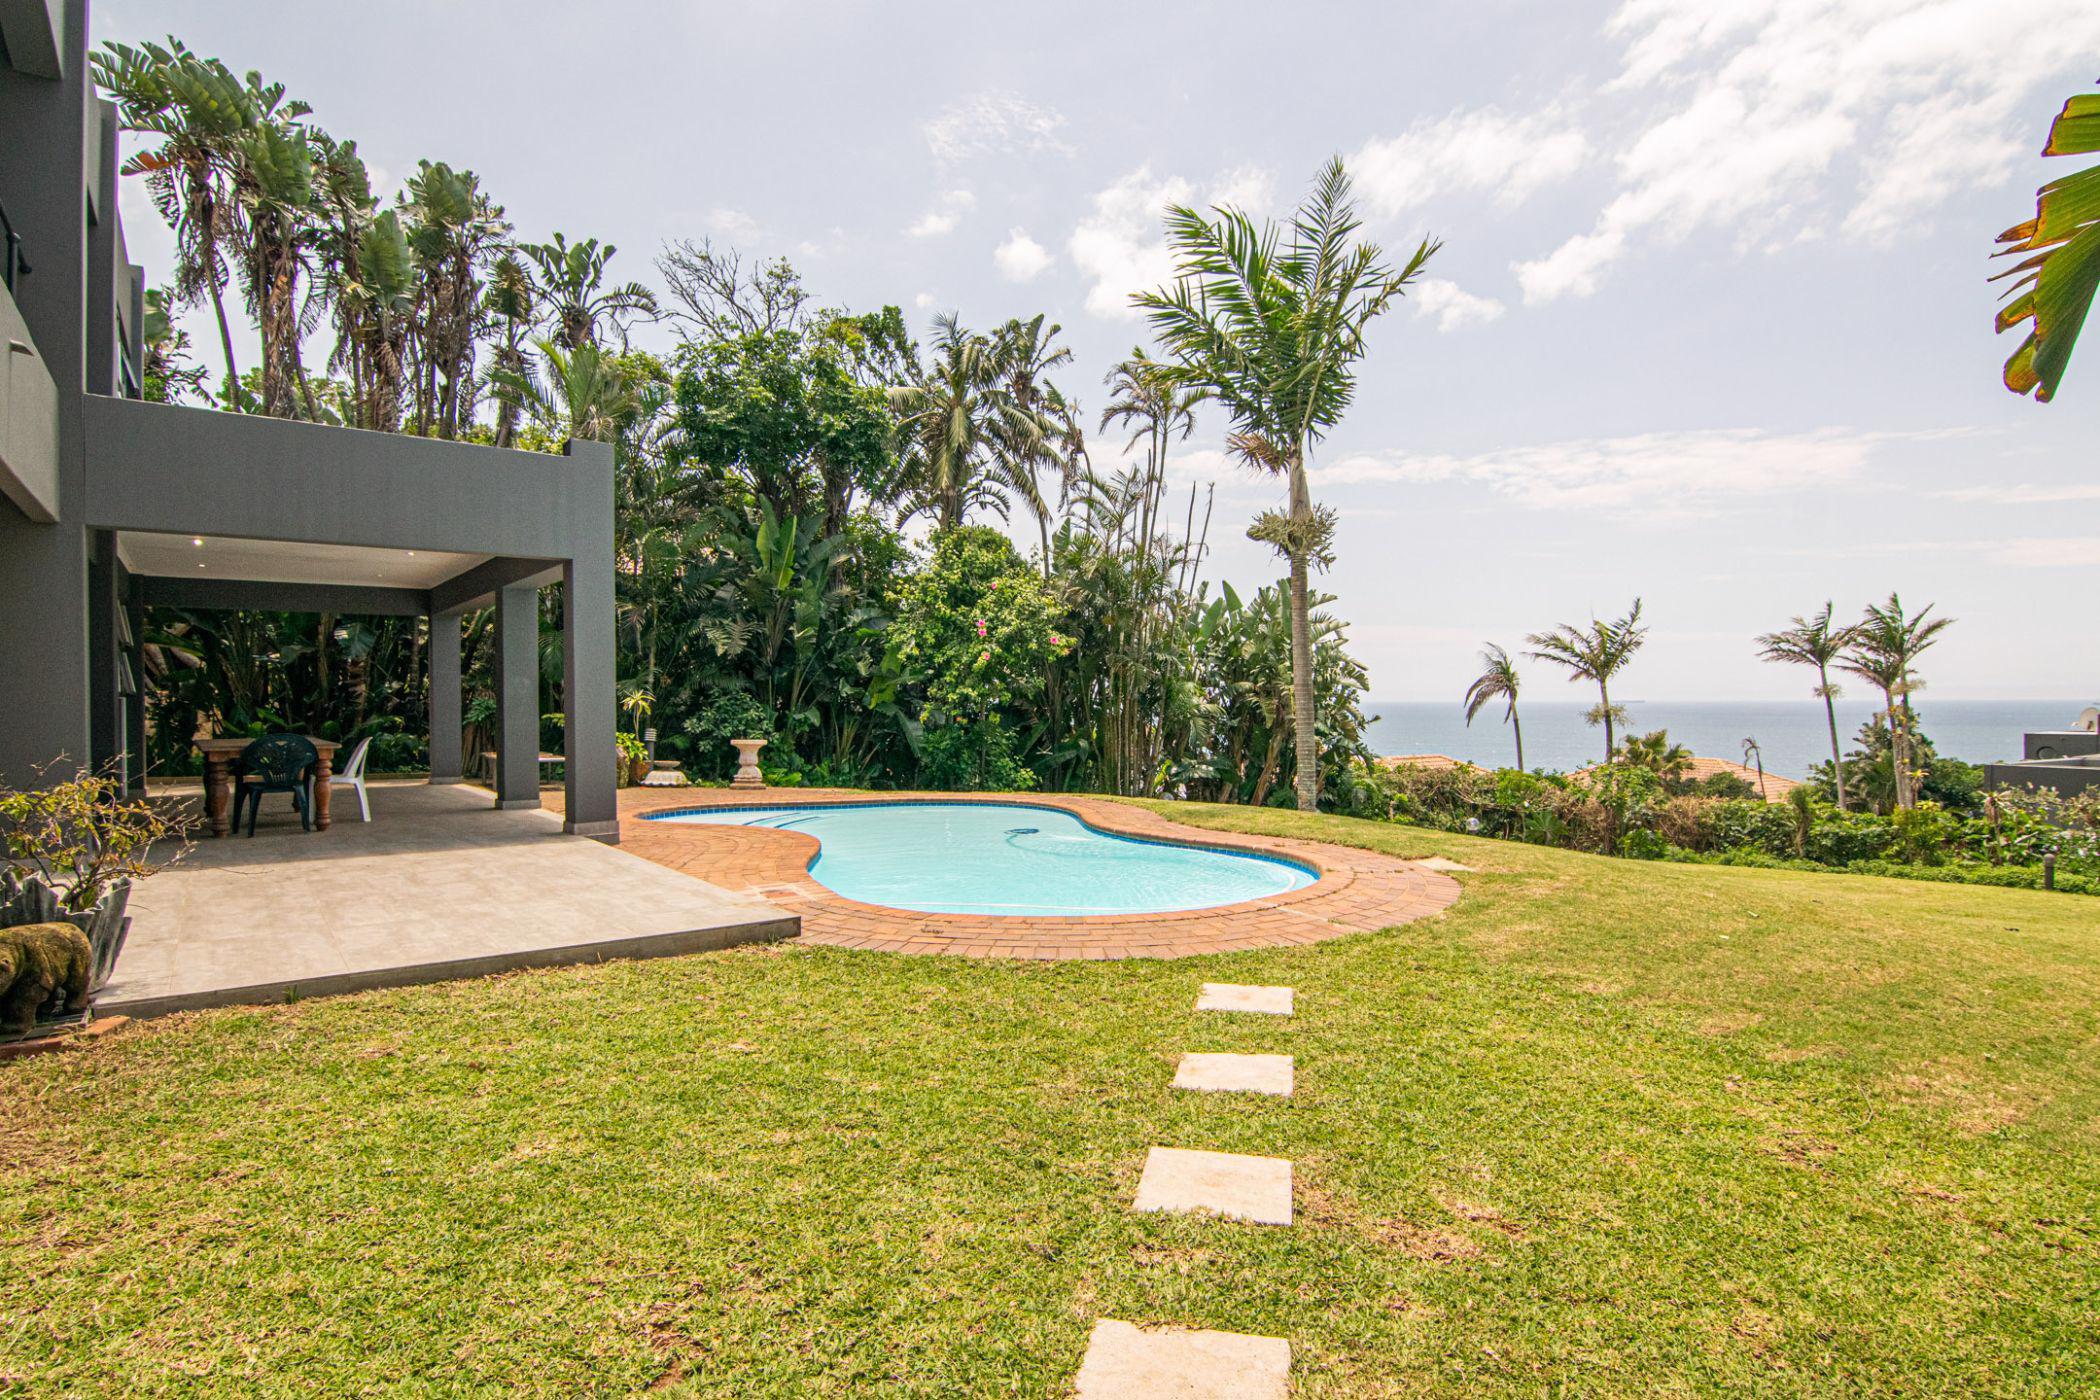 5 bedroom house for sale in Umdloti